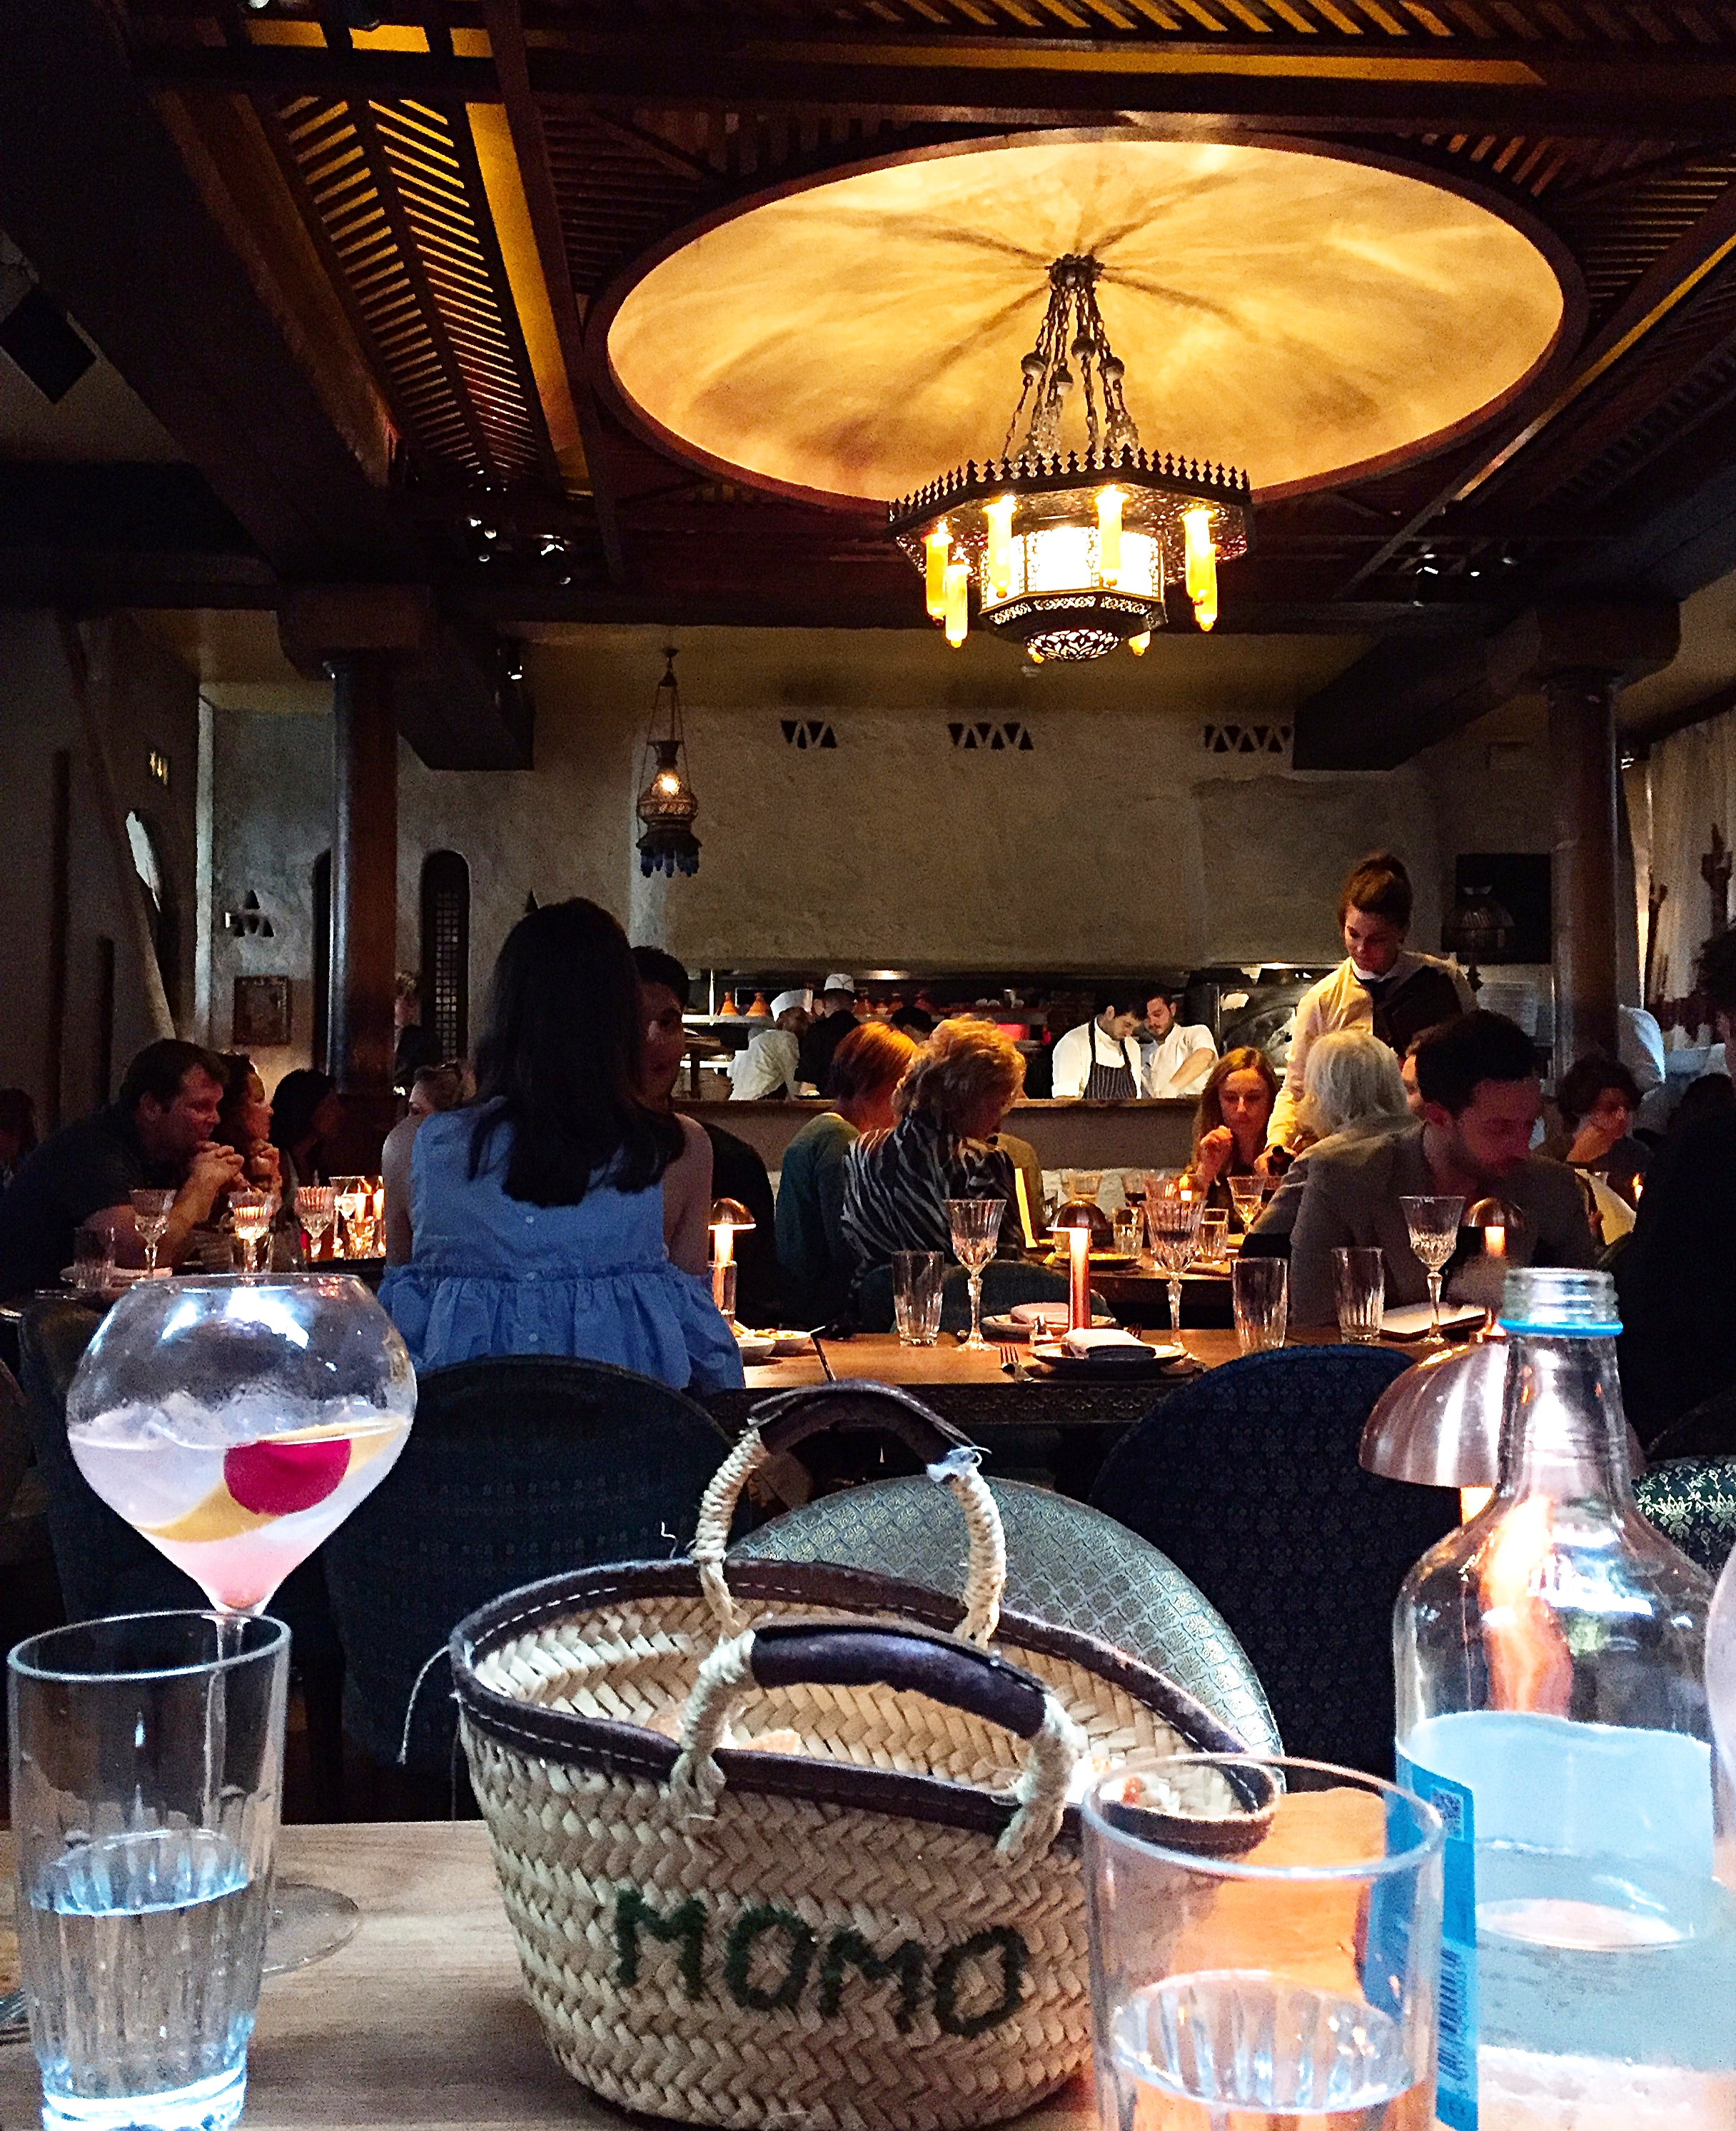 Moroccan decor - Momo restaurant review, Mayfair London